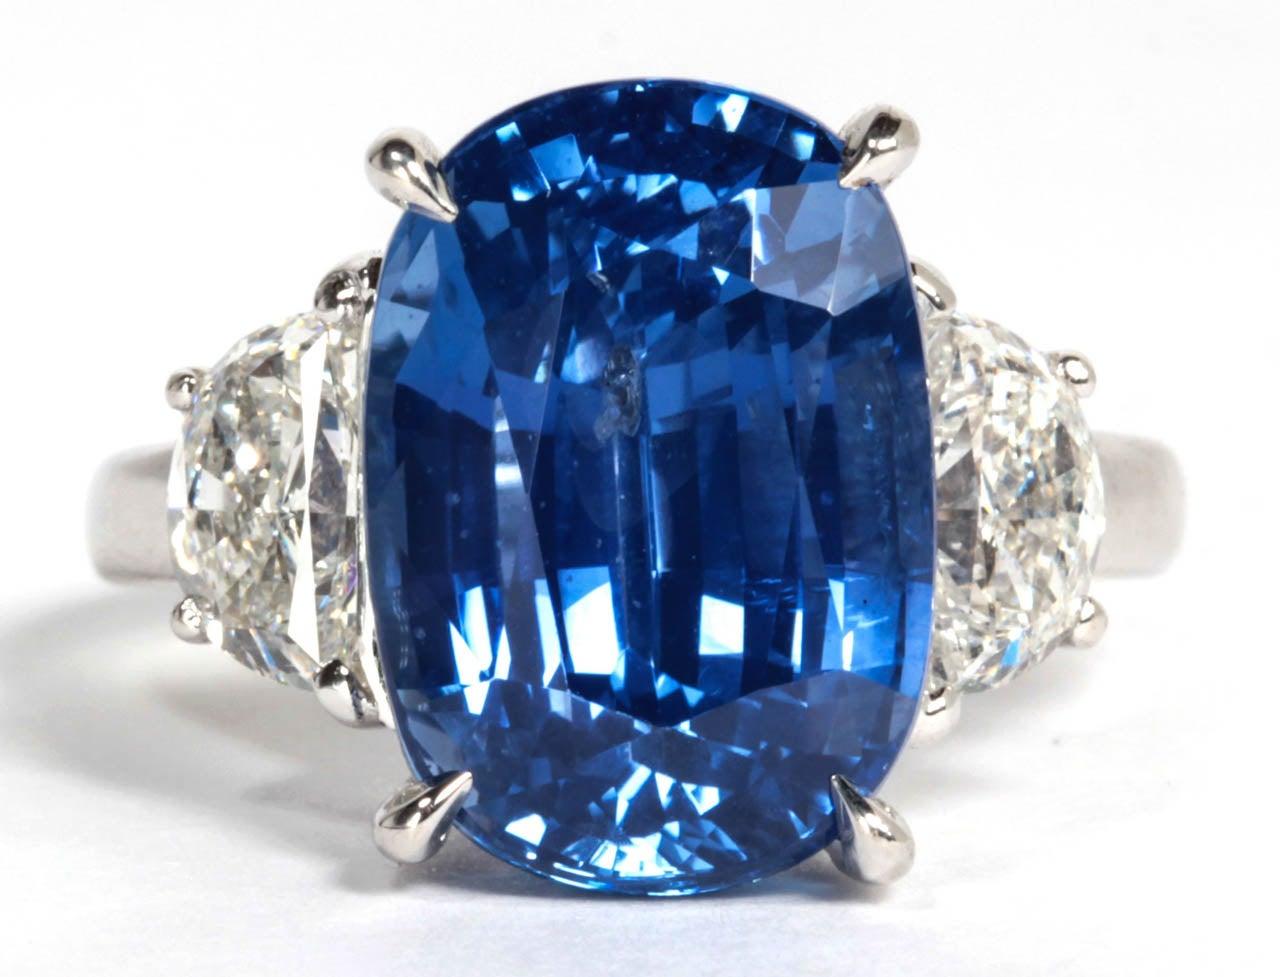 Gorgeous sapphire and diamond ring.   11.51 carat cushion cut